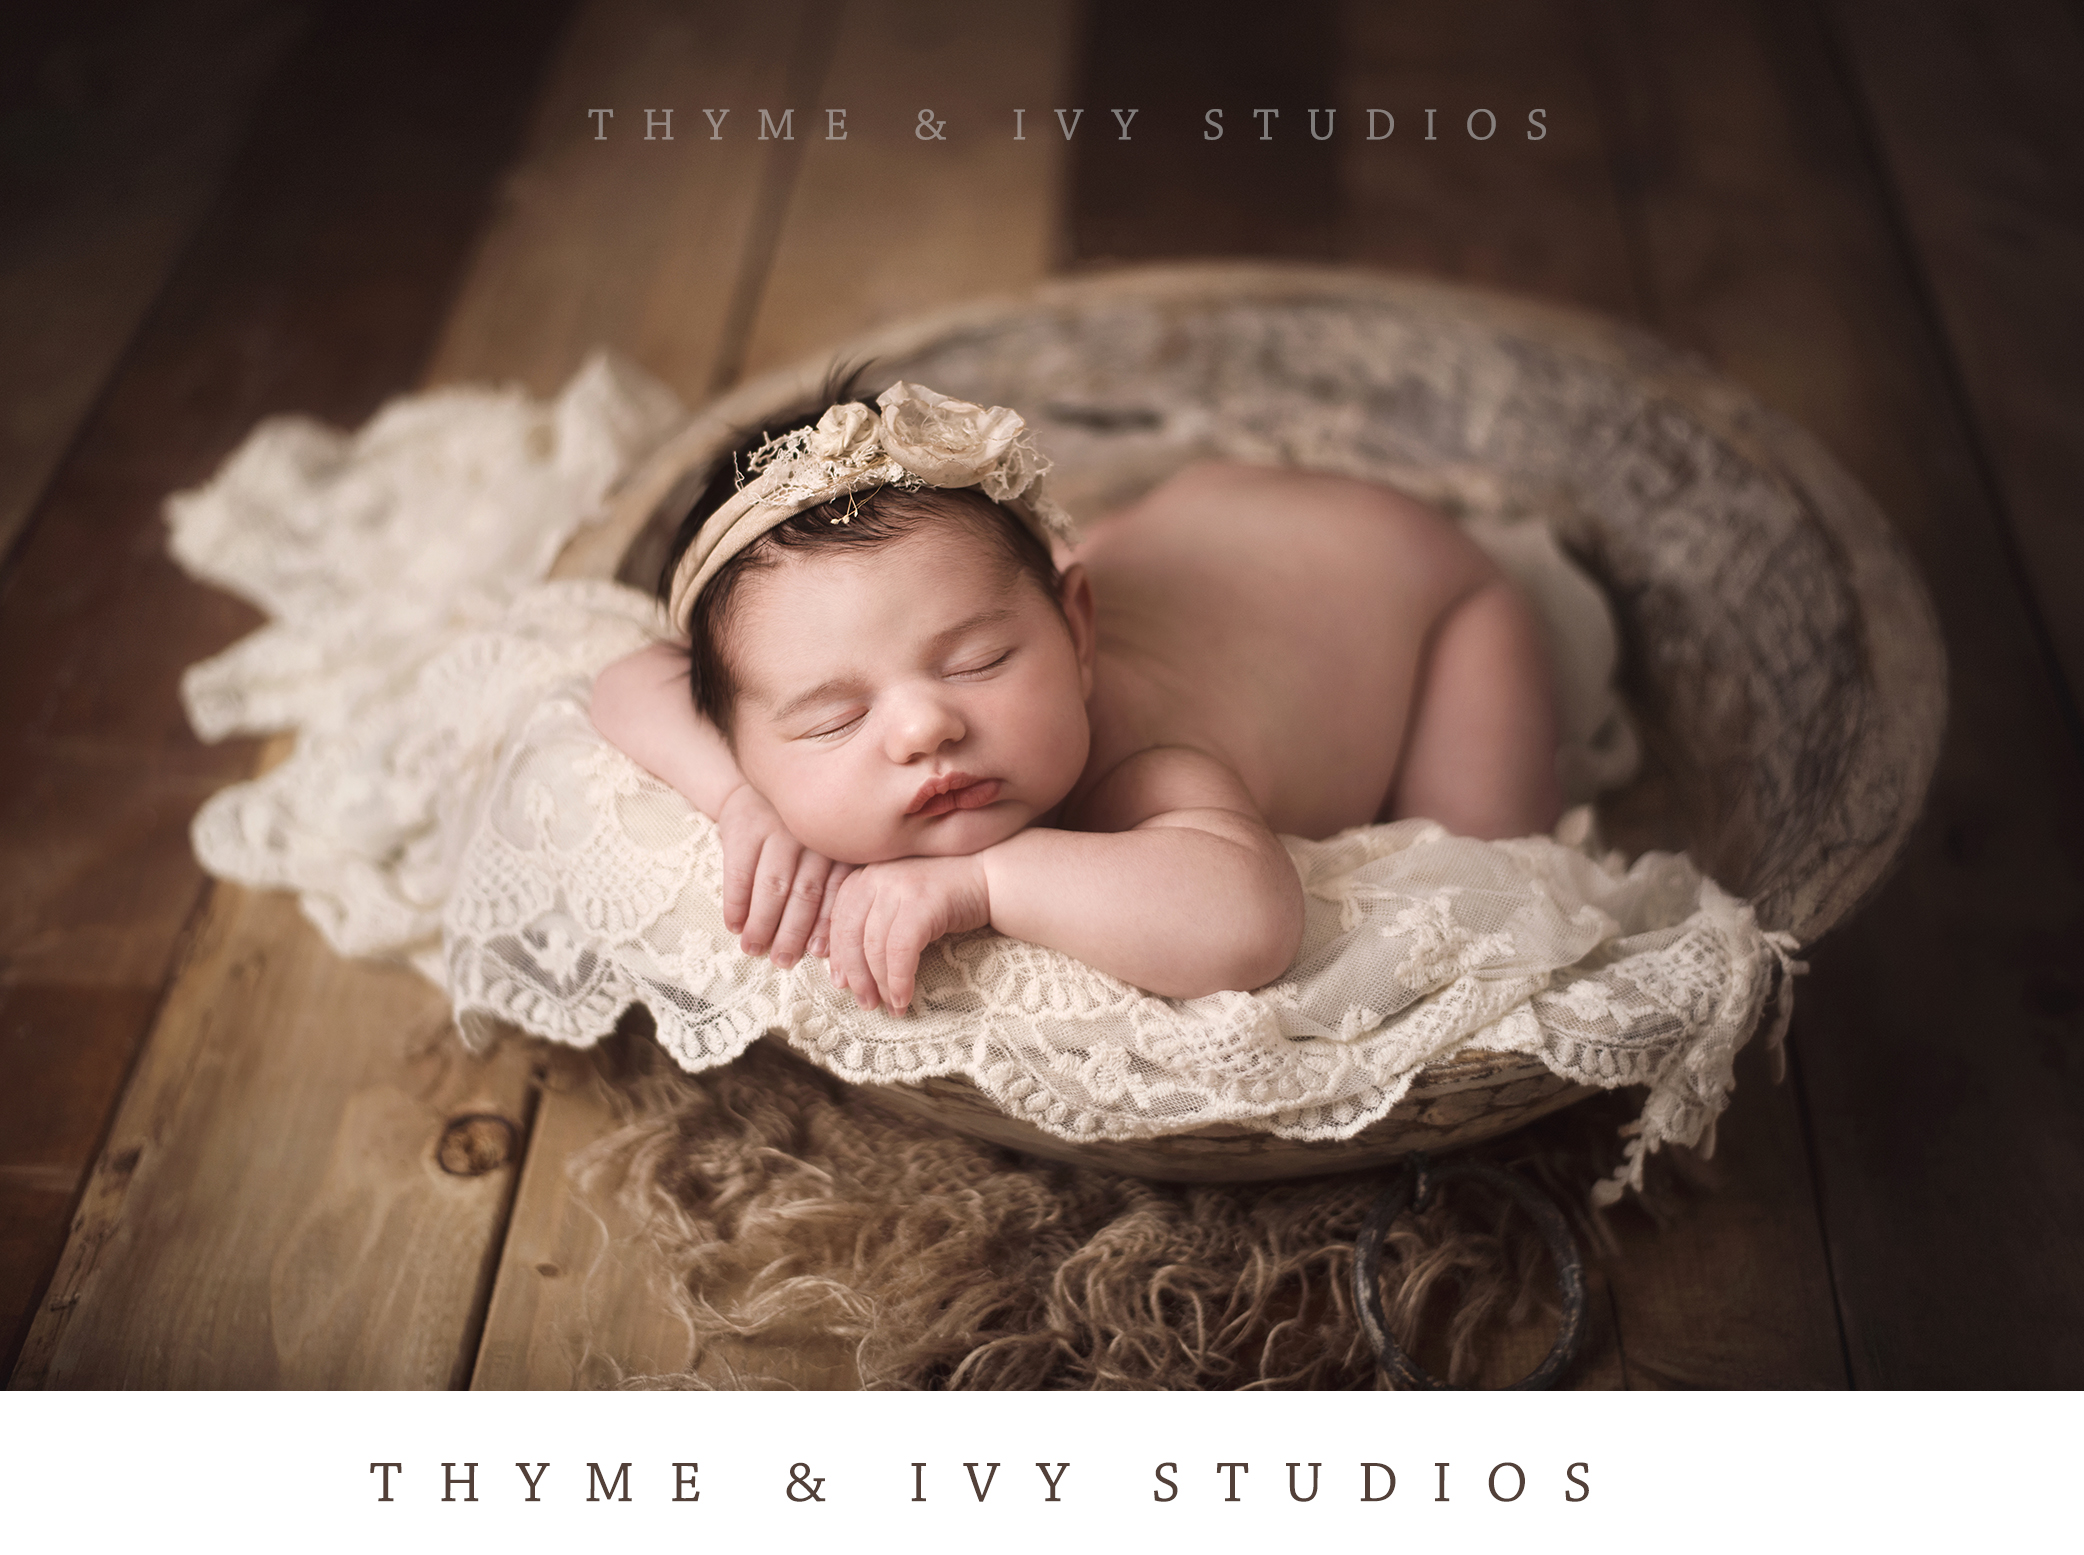 Thyme-Ivy-studios3